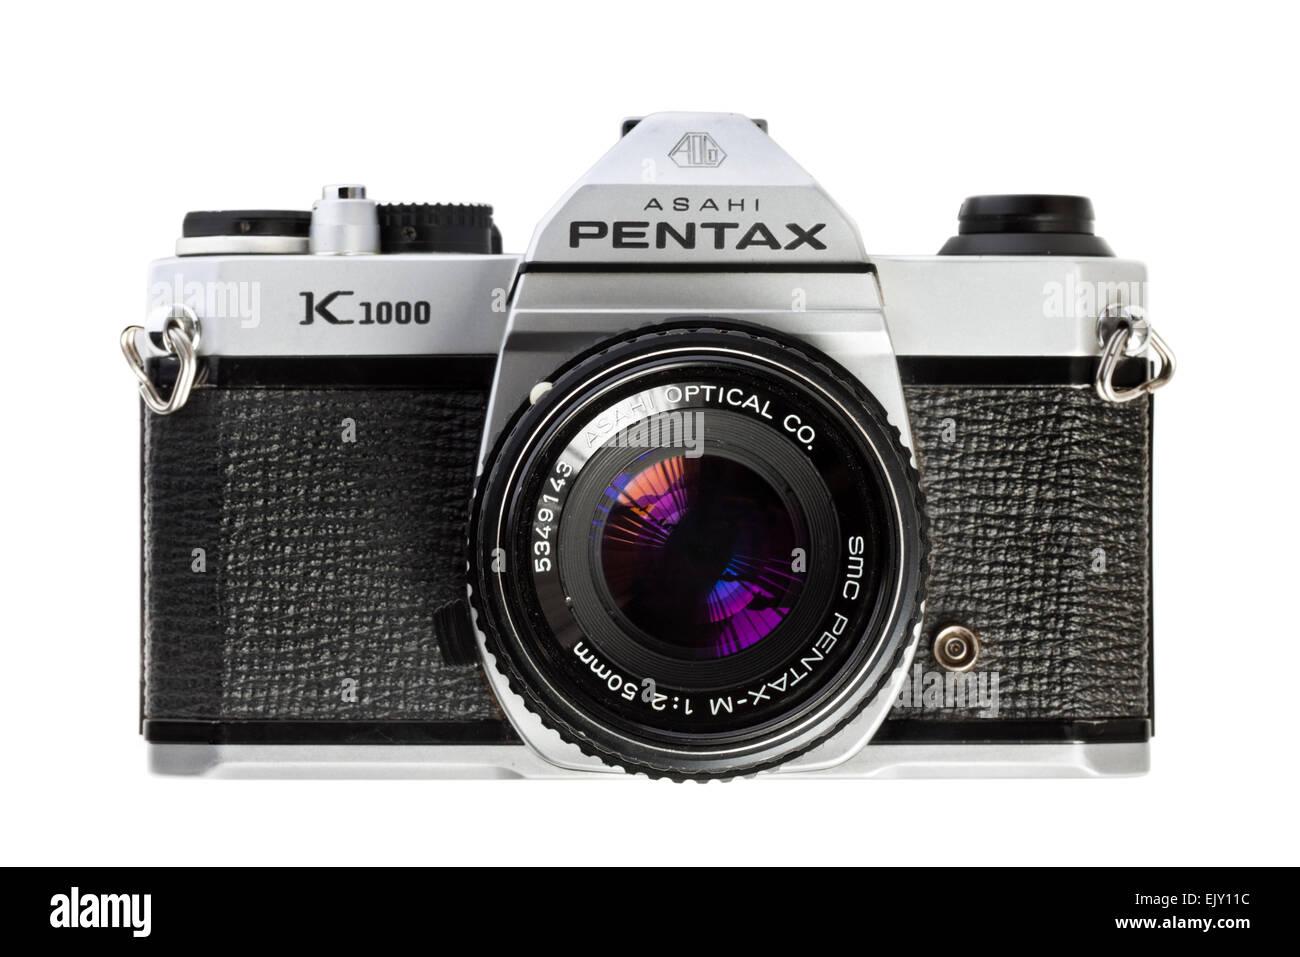 Vintage late 1970's Asahi Pentax K1000 35mm SLR film camera with Pentax-M 50mm f/2 SMC lens. - Stock Image